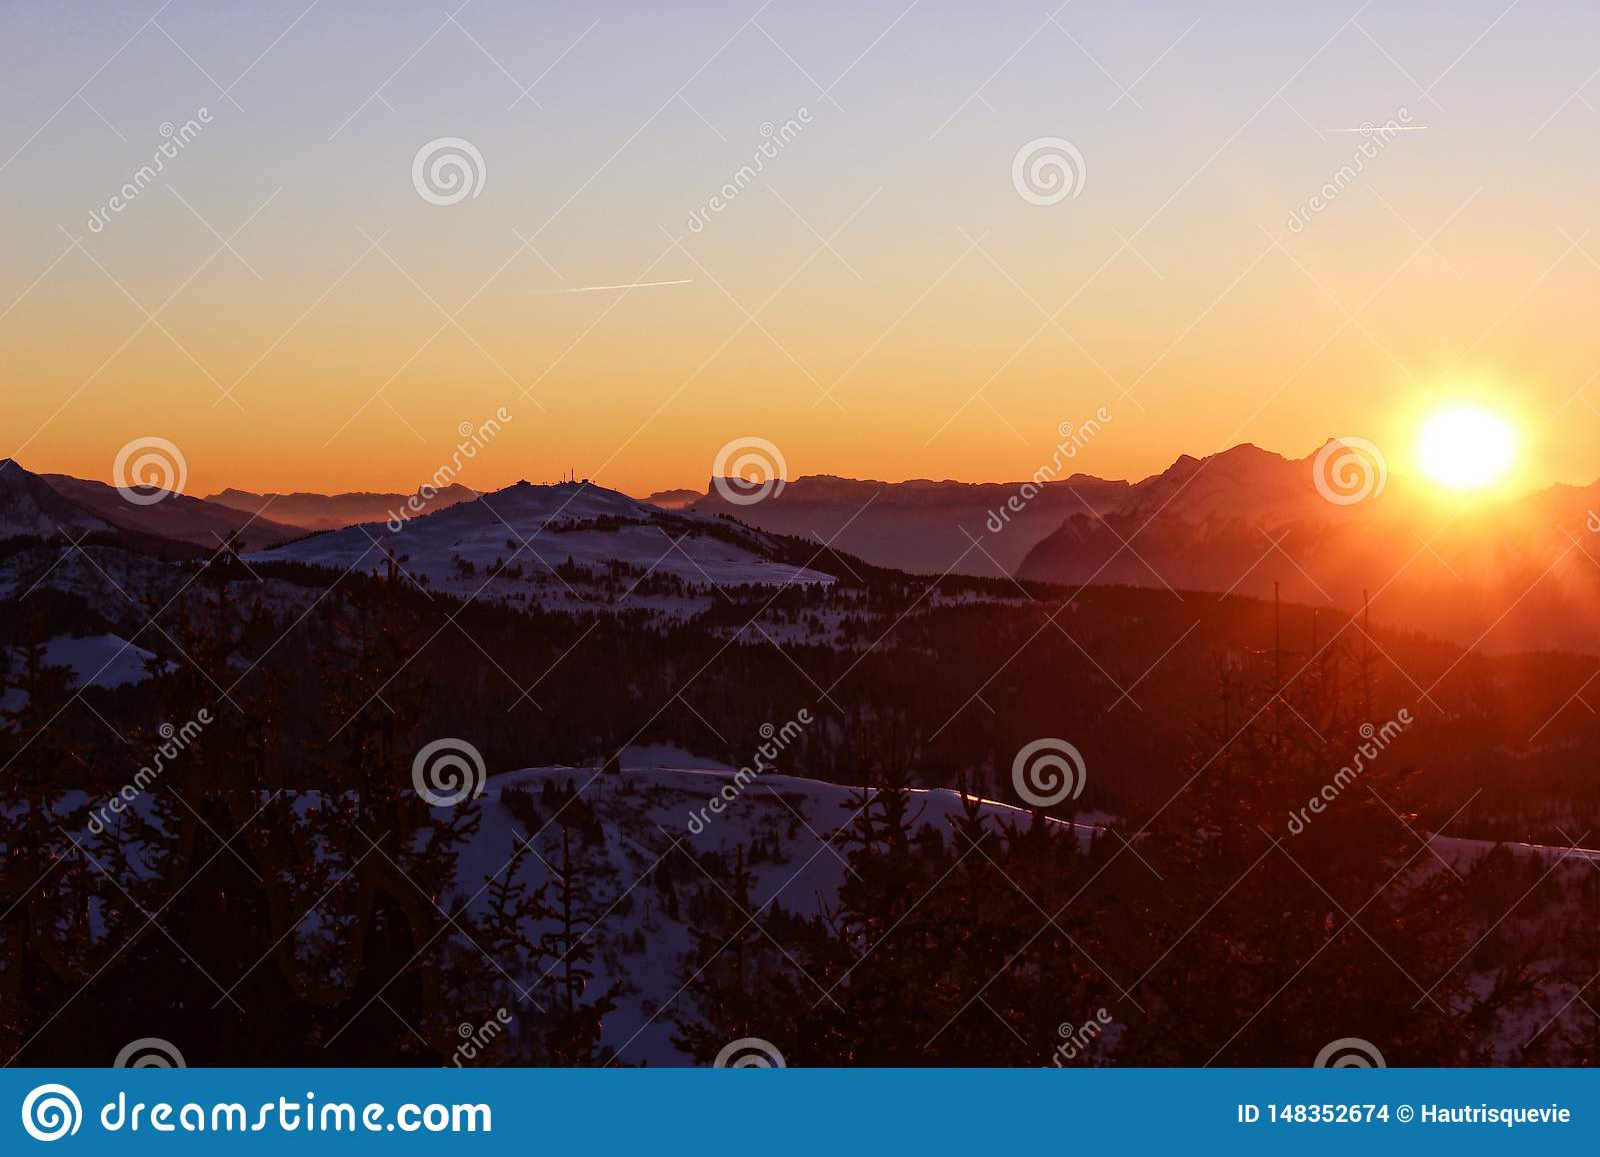 Заход солнца ласкает горы во французских горных вершинах